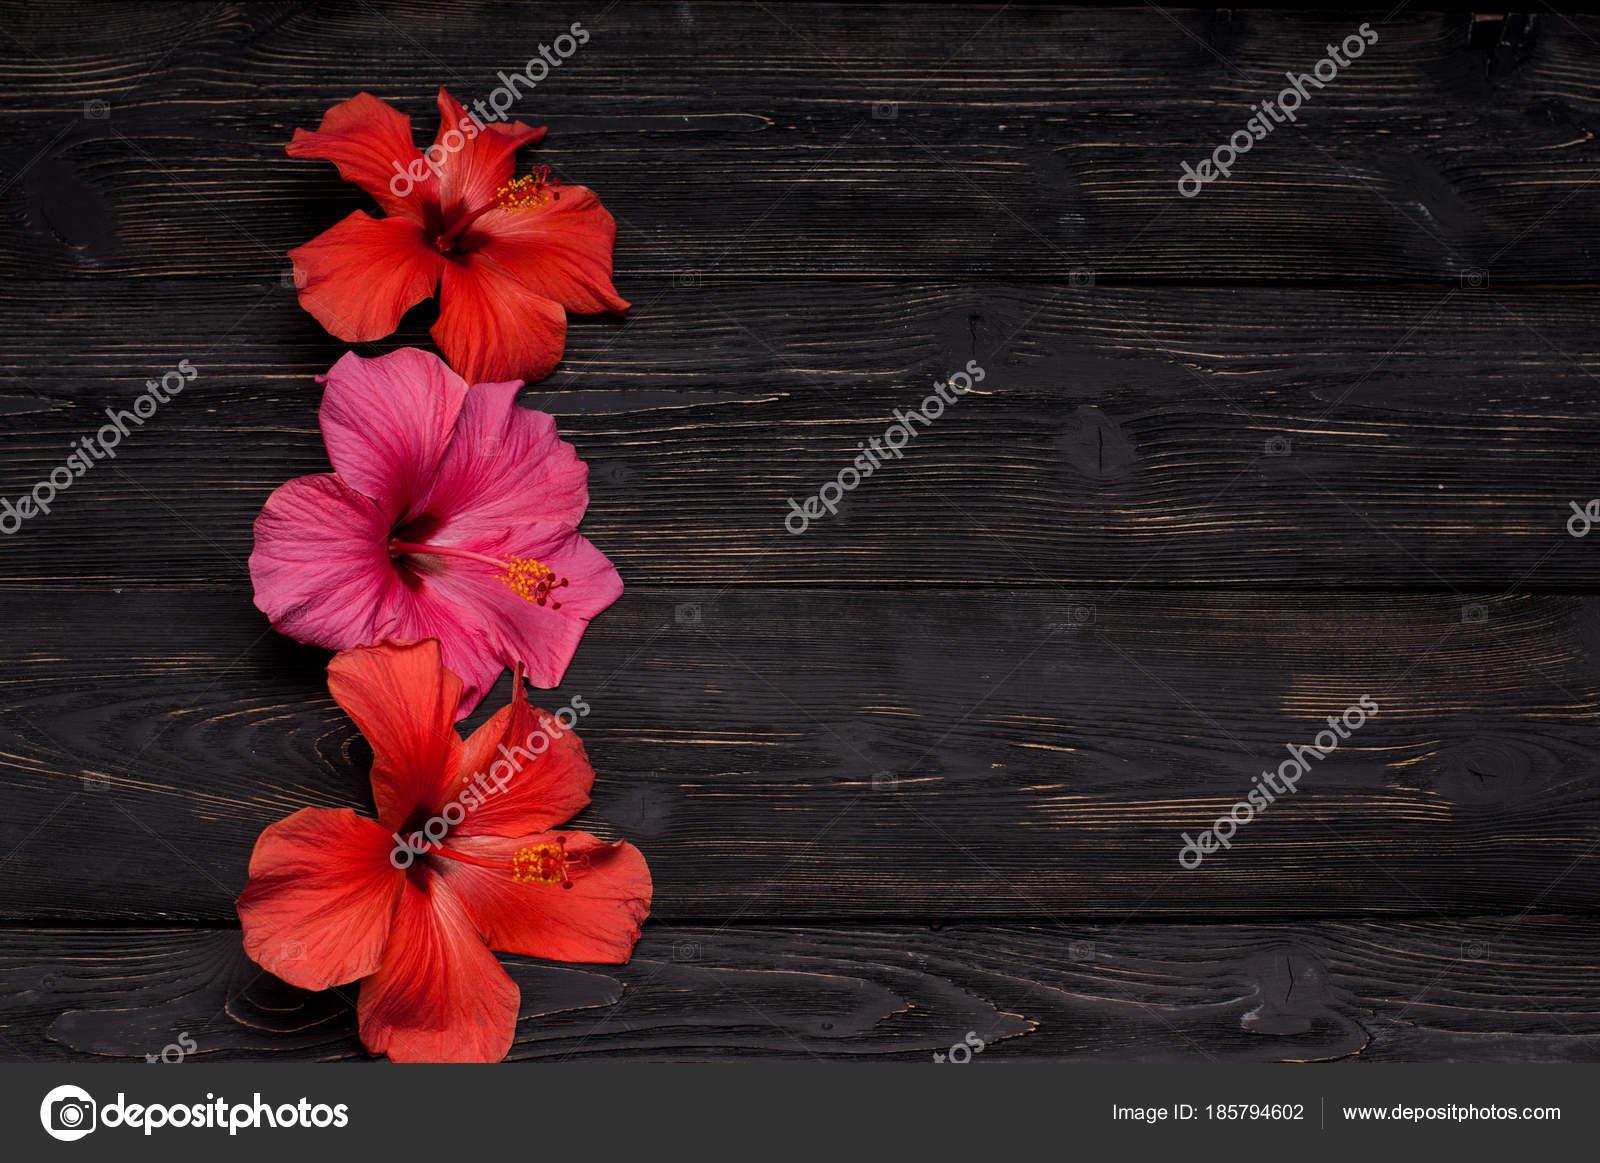 Red hibiscus flowers black background stock photo foras05 185794602 red hibiscus flowers black background stock photo izmirmasajfo